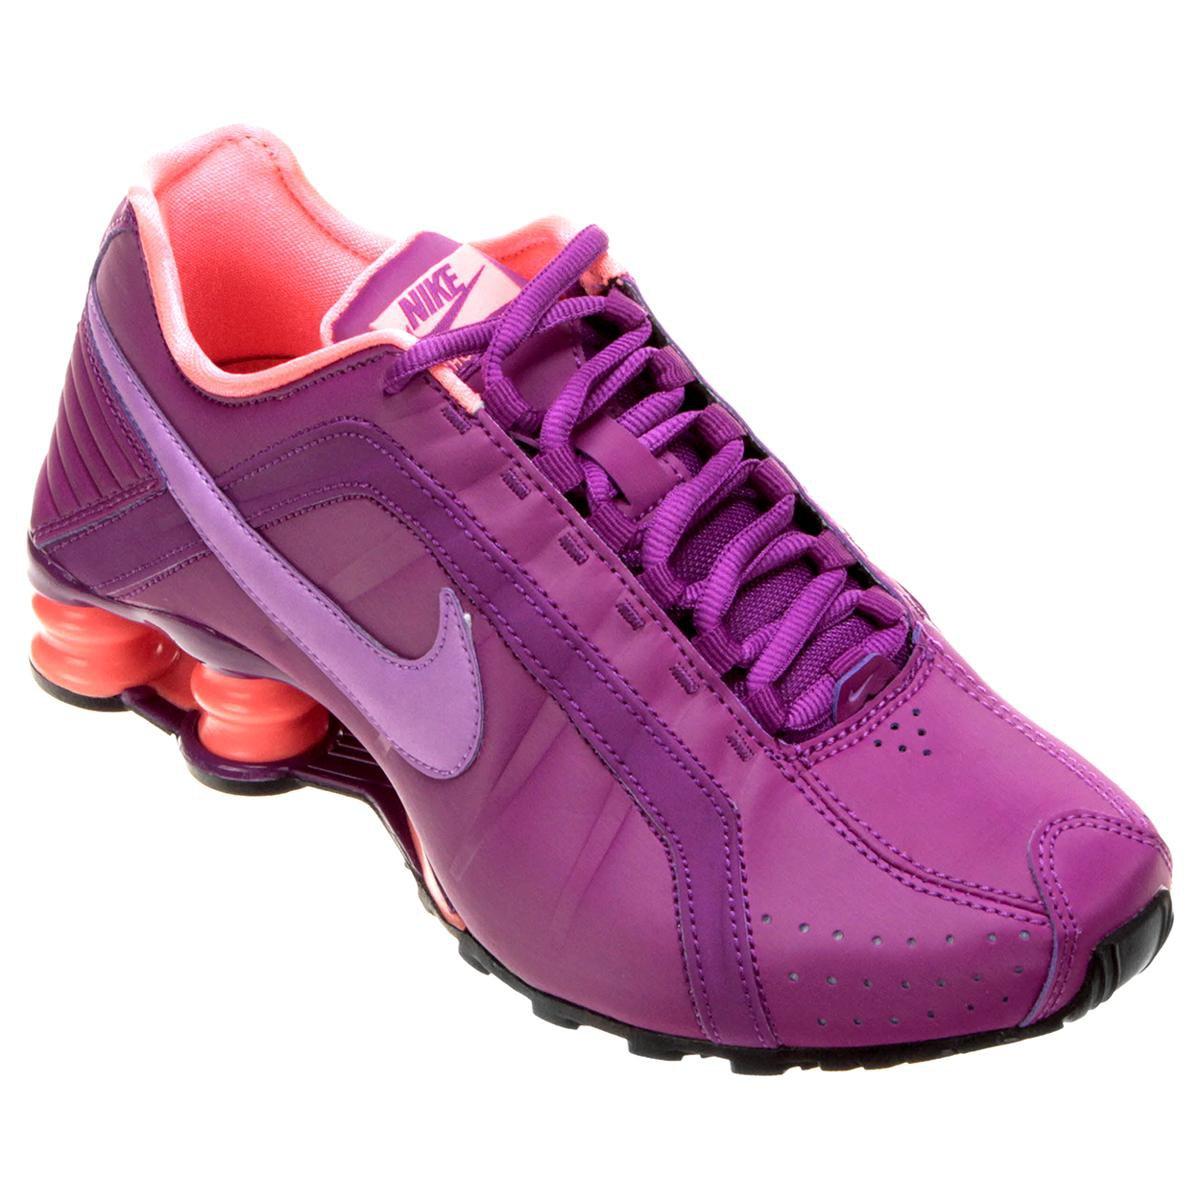 0ab7b82f7c8 france fornecedornetshoes. tênis nike air max sequent 2 masculino e0f5f  11c89  sweden netshoes nike shox junior feminino 4d70e c2ccc